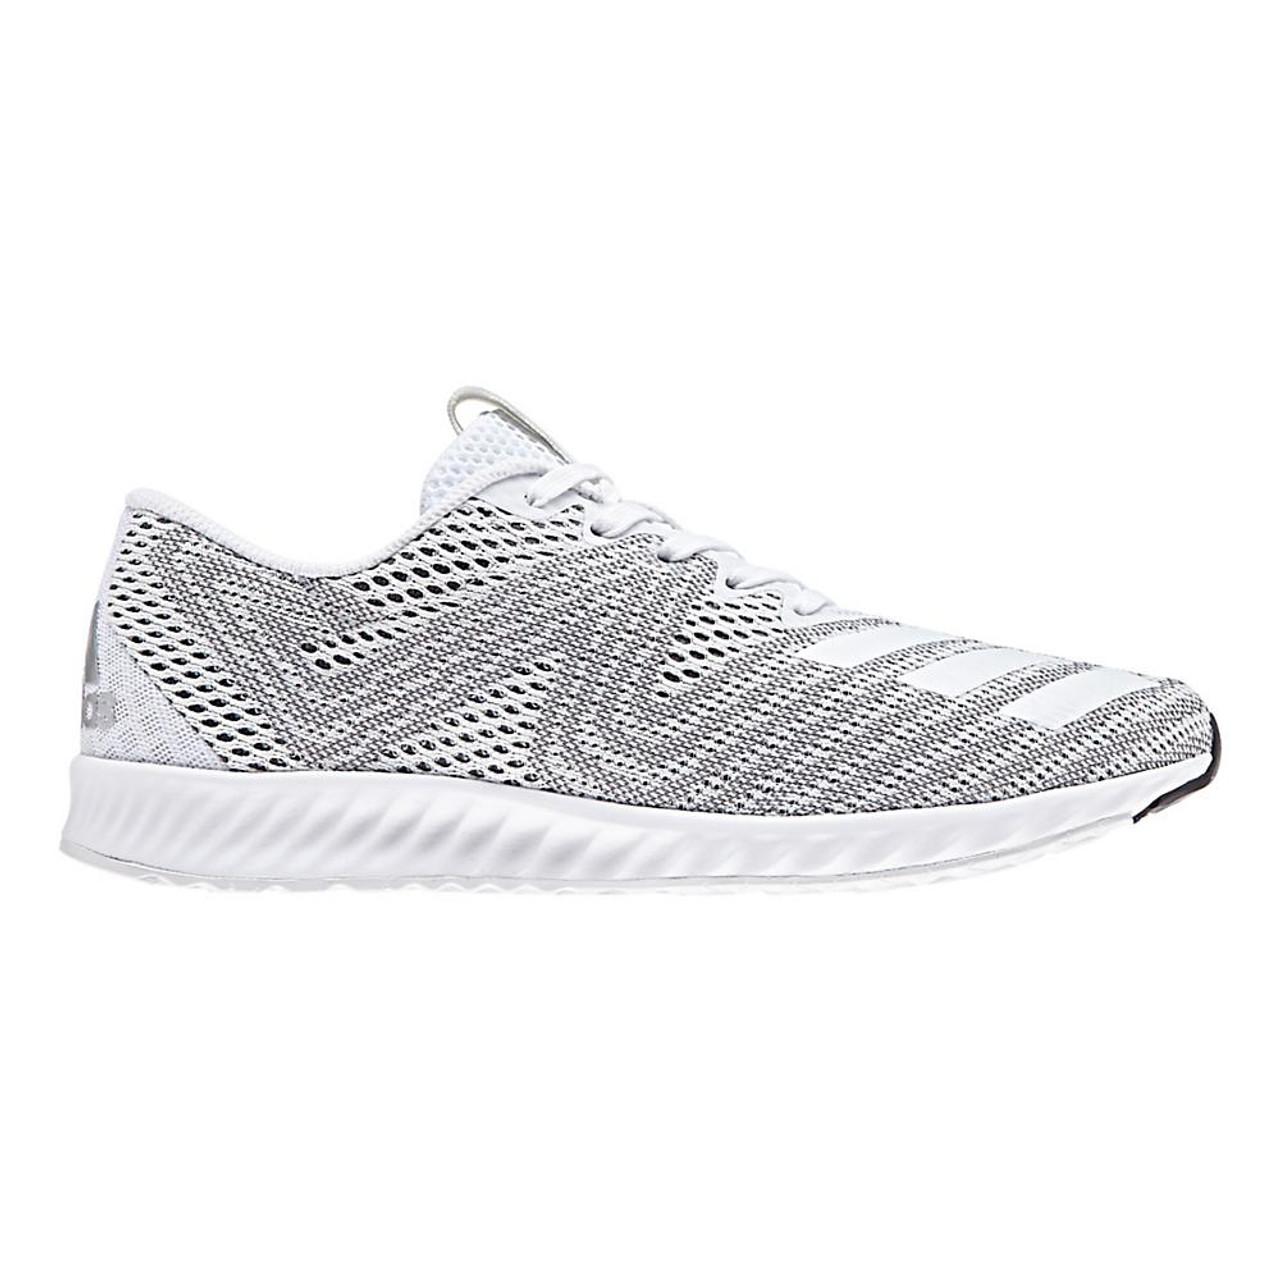 adidas AeroBounce PR Running Shoes